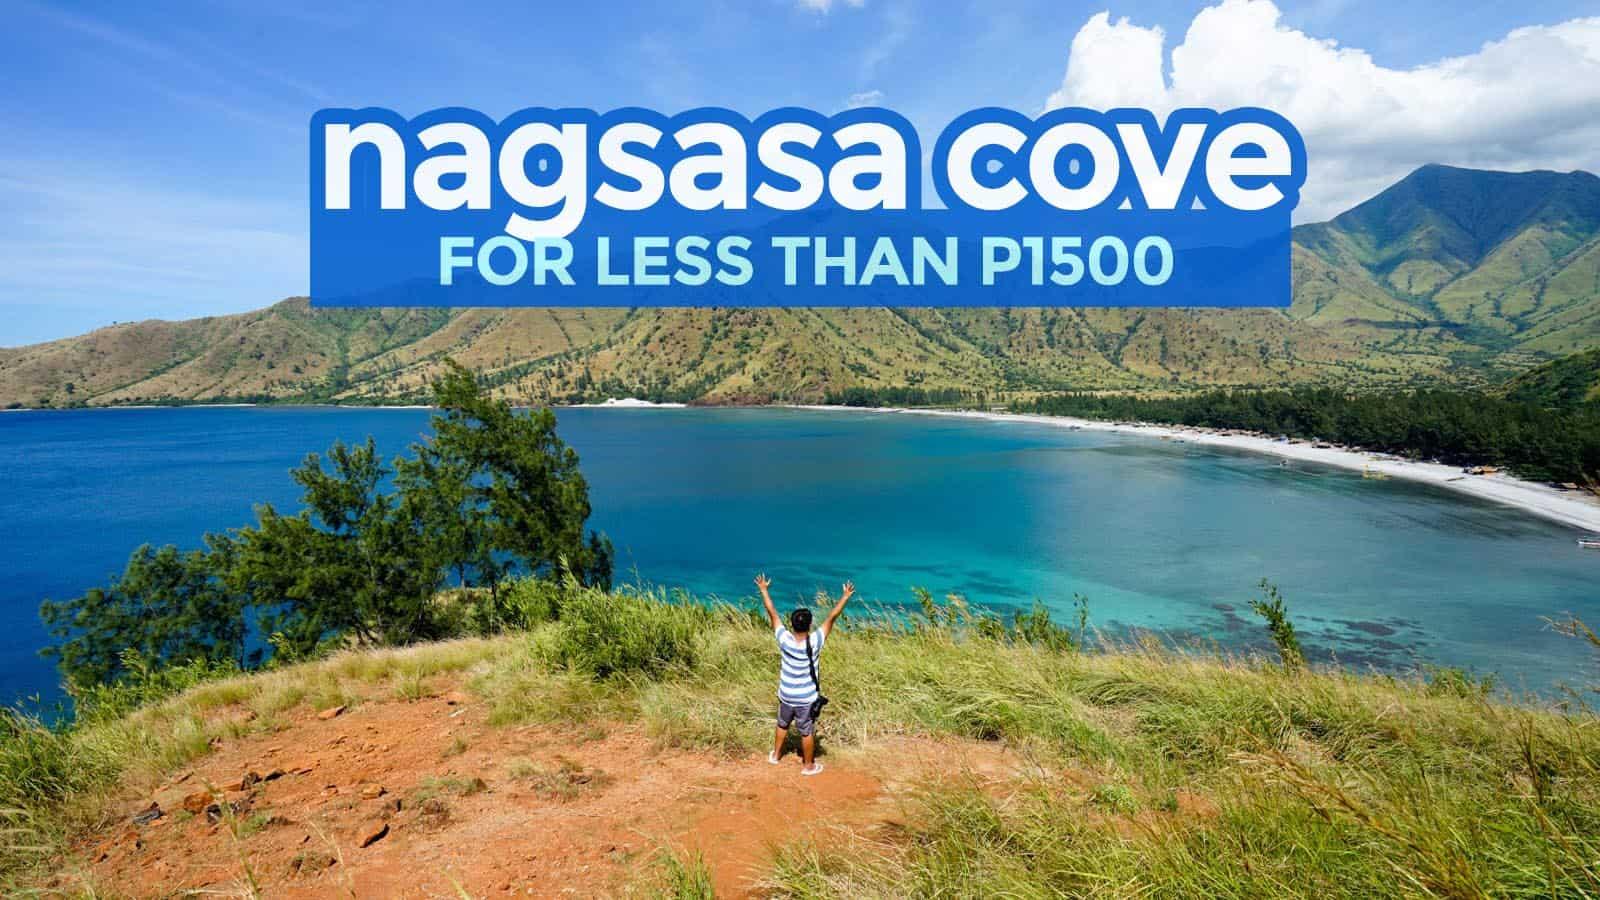 NAGSASA COVE: 旅行指南和预算行程   穷游者的行程博客